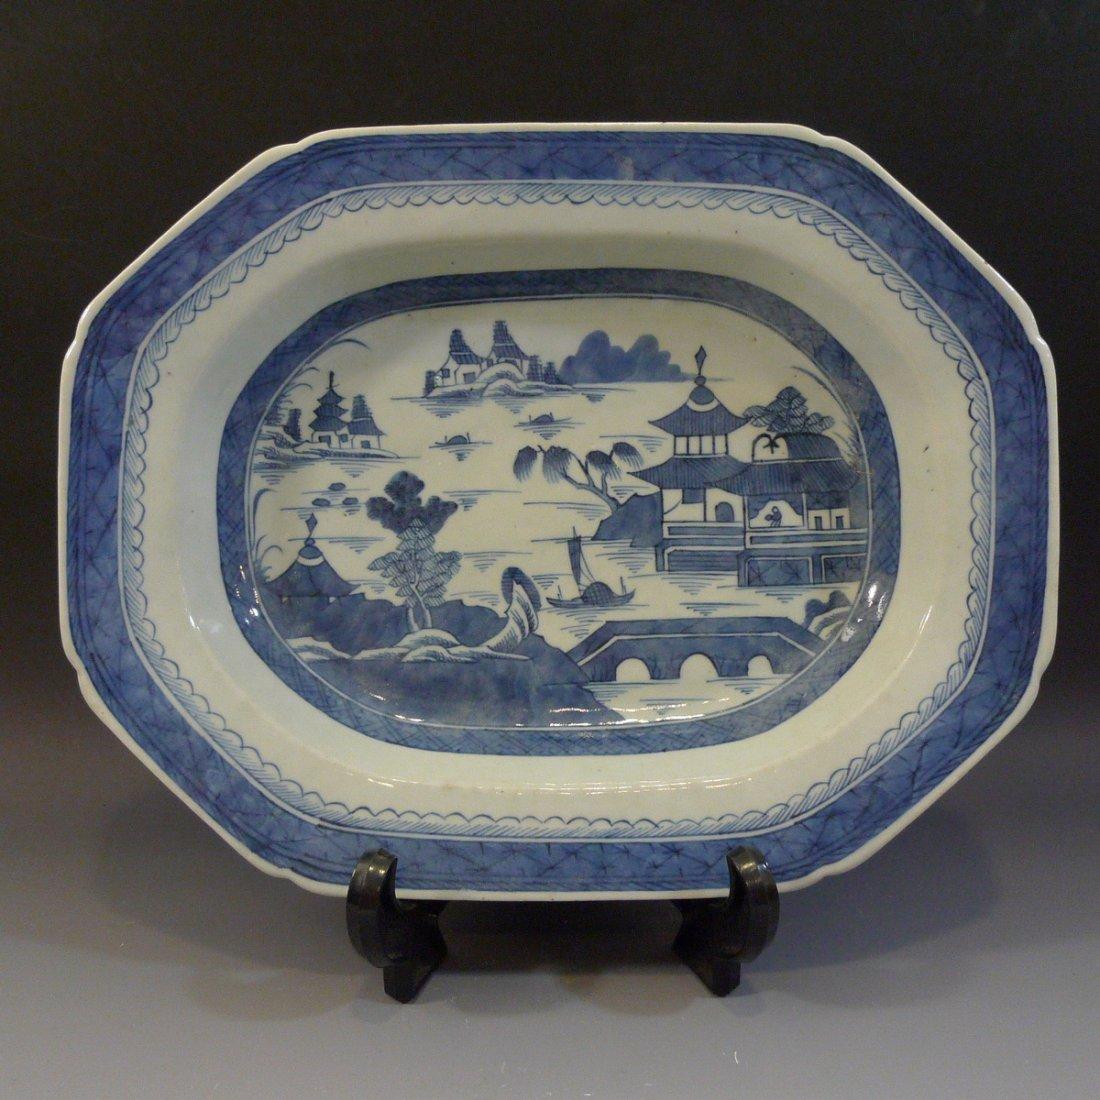 LARGE ANTIQUE CHINESE BLUE WHITE PORCELAIN PLATTER -